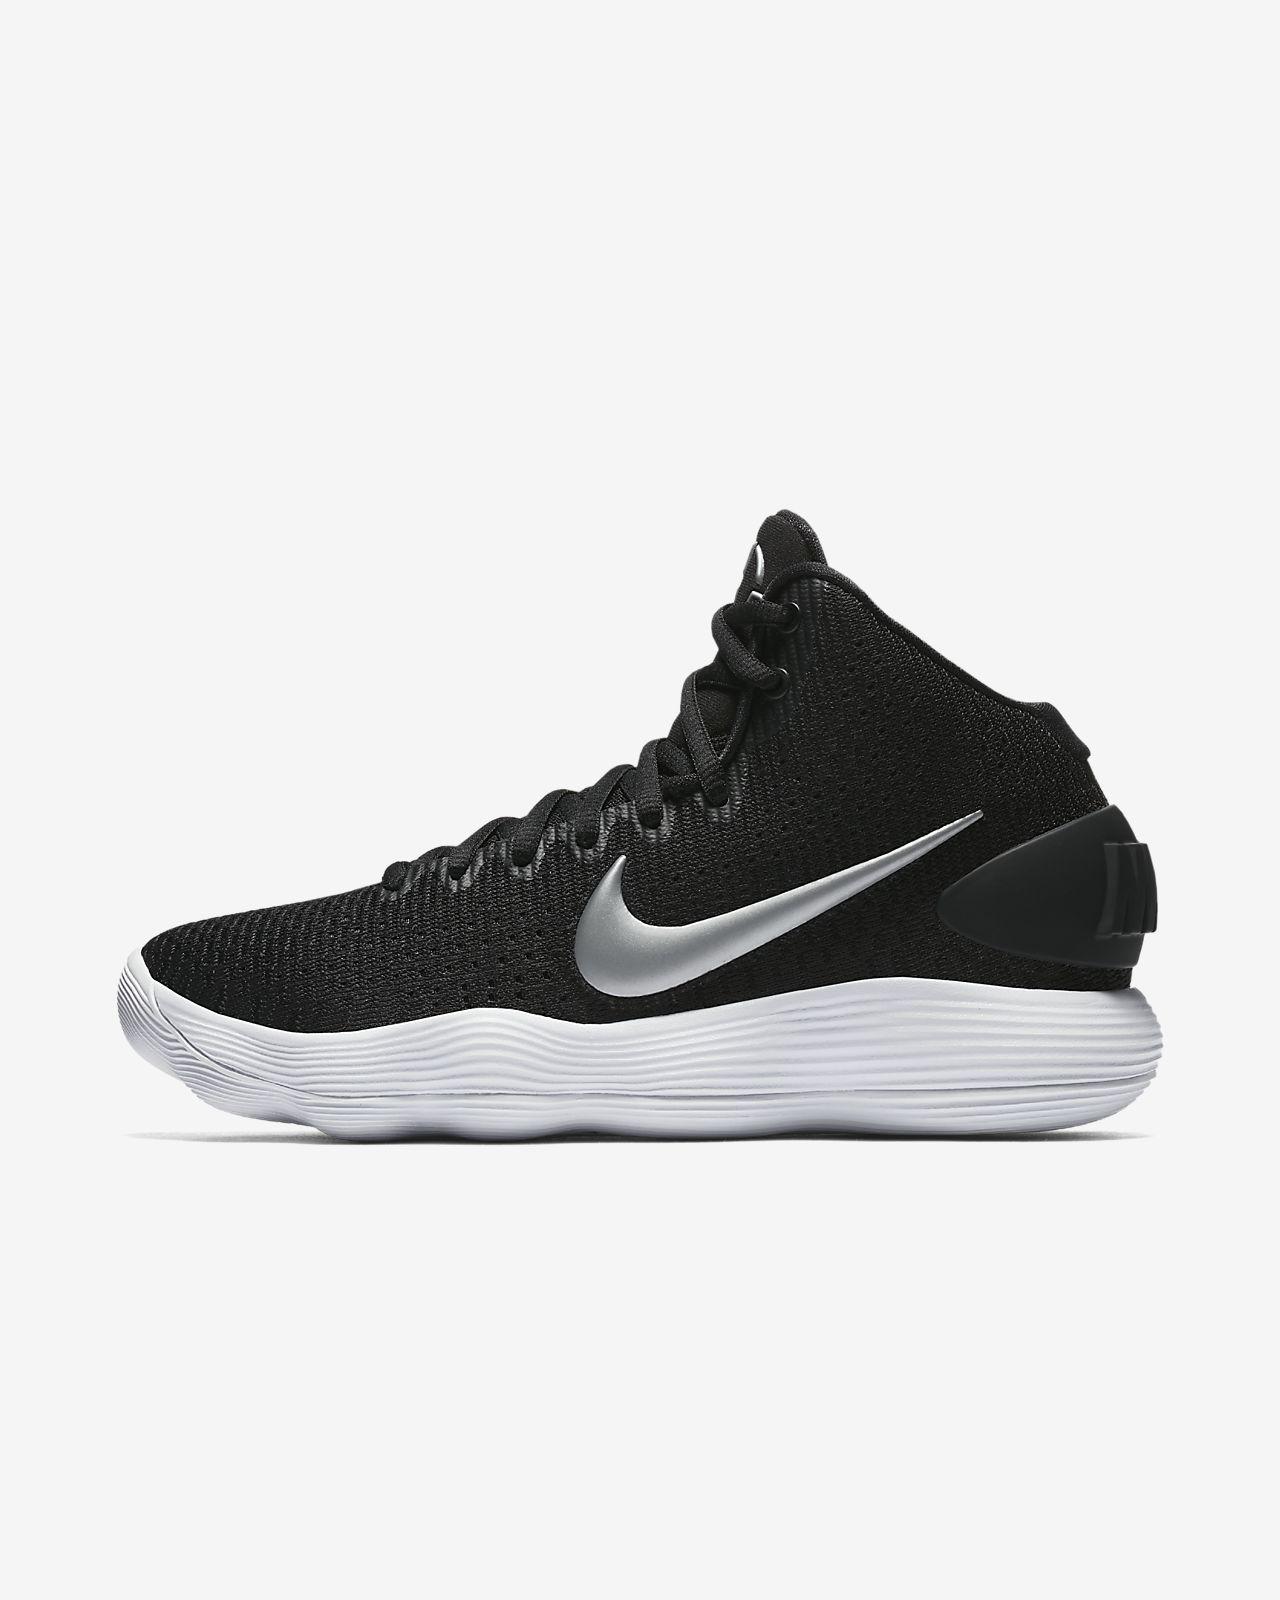 Eastbay Womens Basketball Shoes